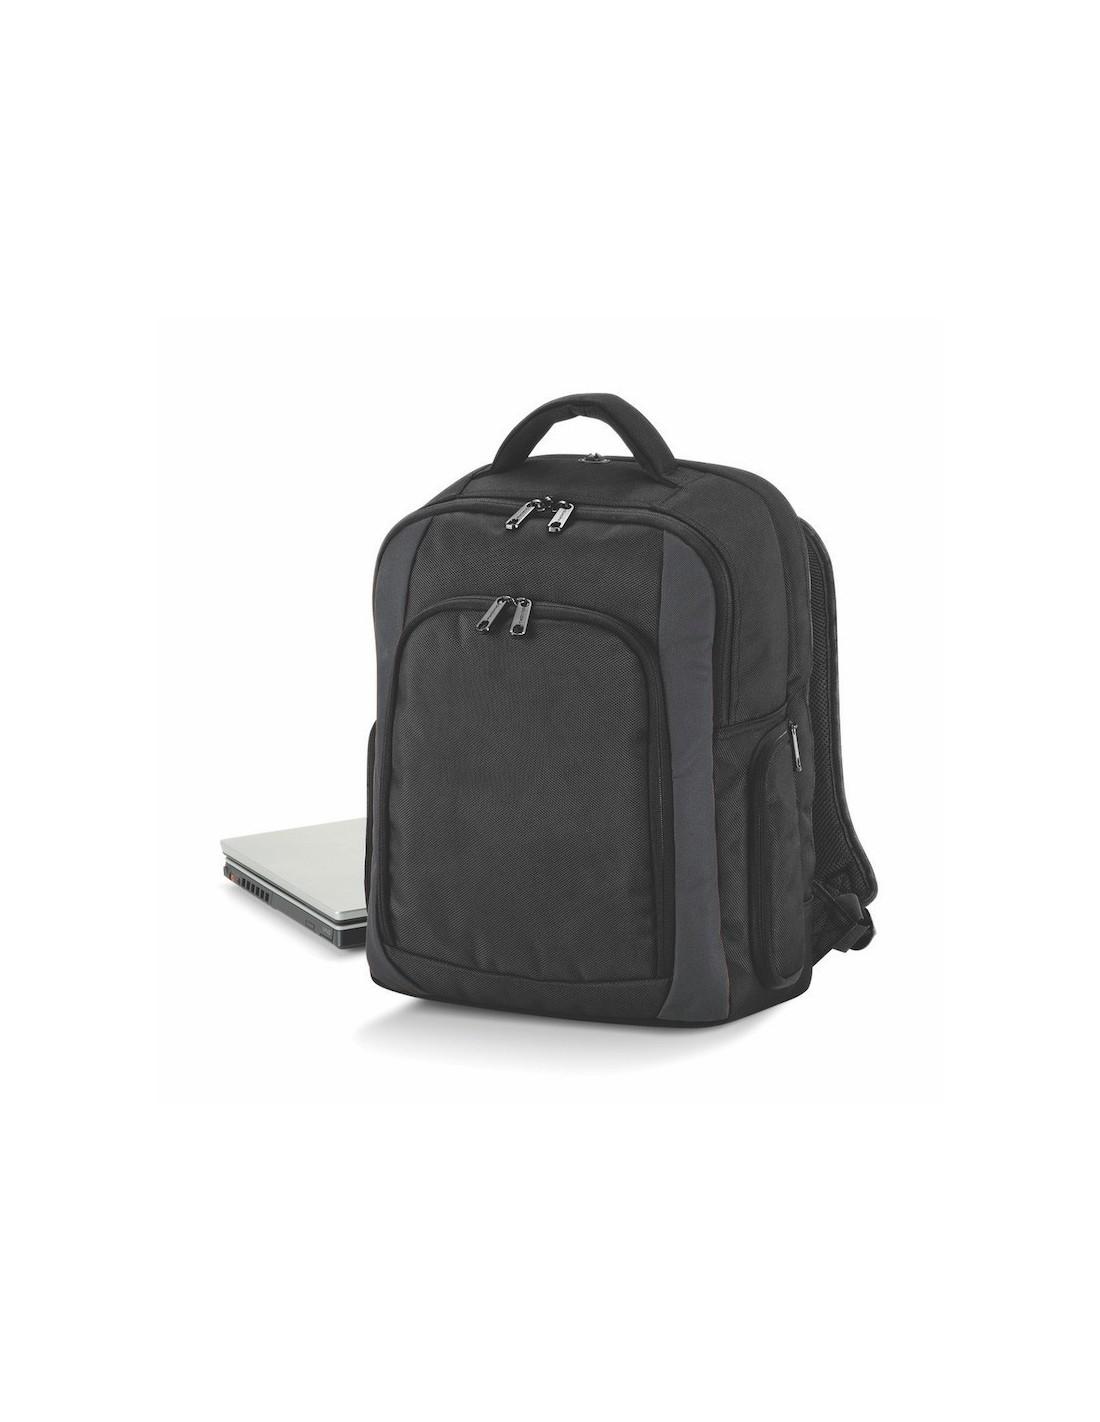 96d18cbca6b4e Plecak na laptopa Quadra Tungsten™